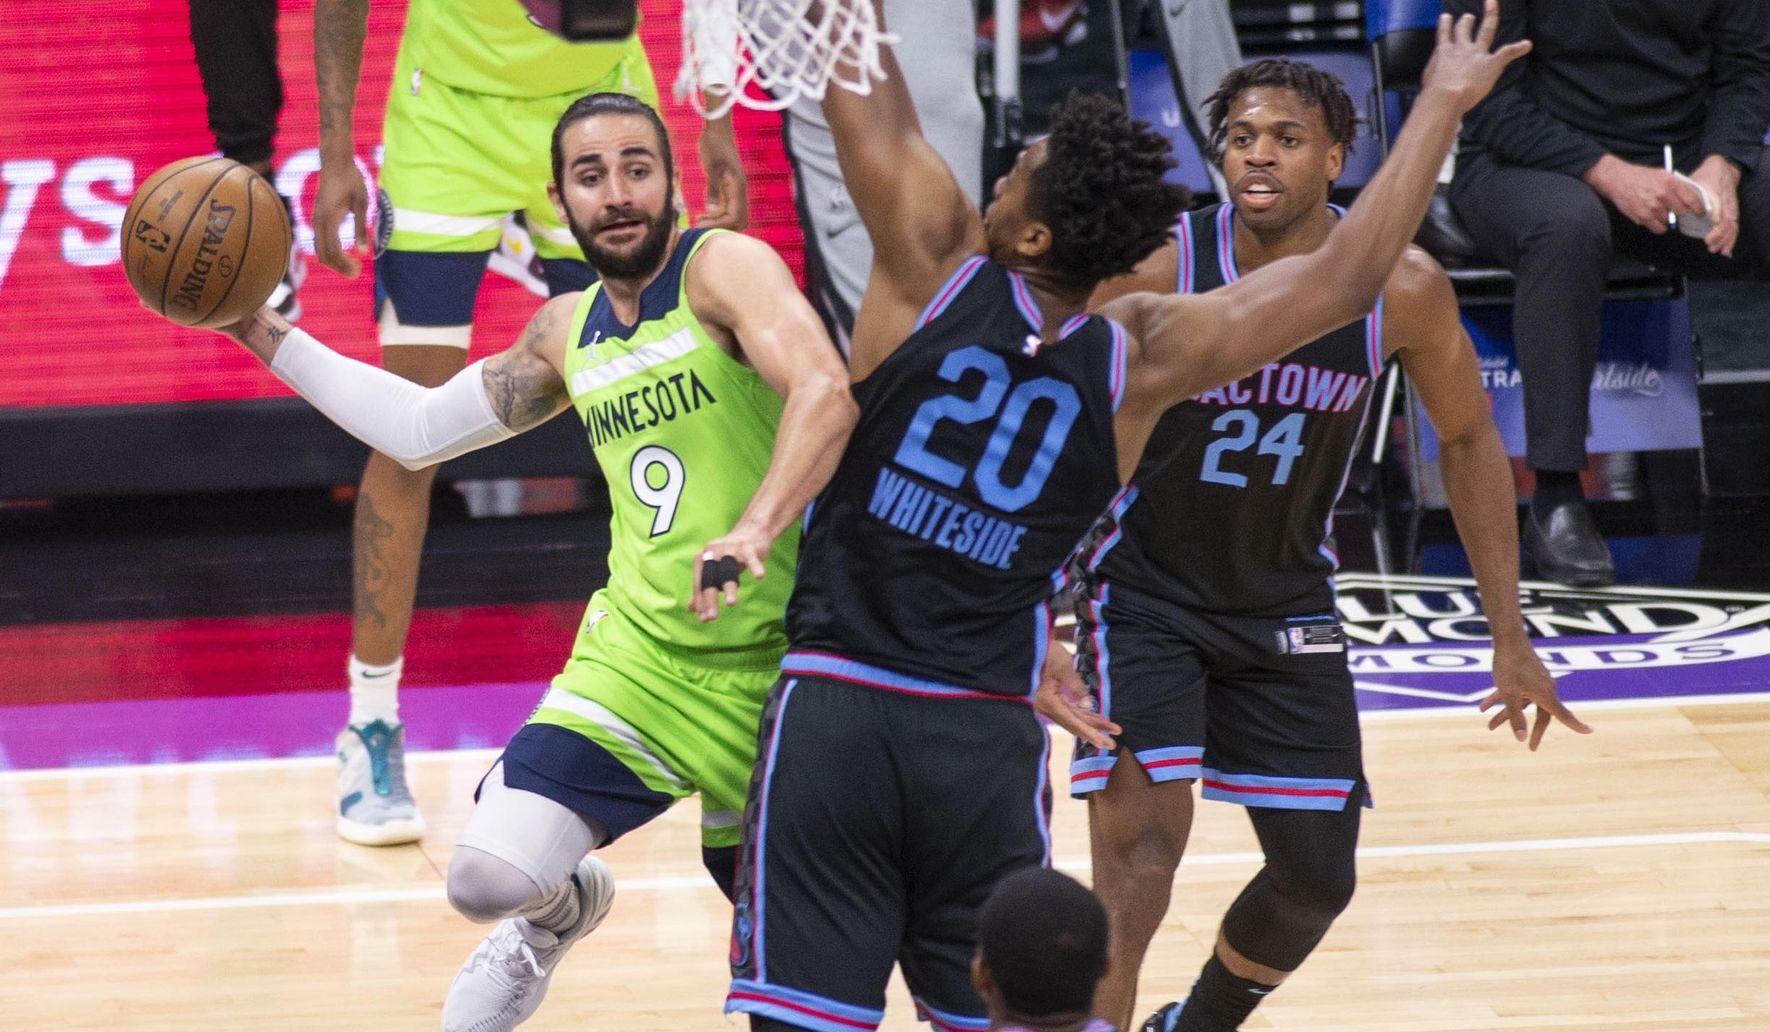 Timberwolves_kings_basketball_93019_c0-117-2446-1543_s1770x1032